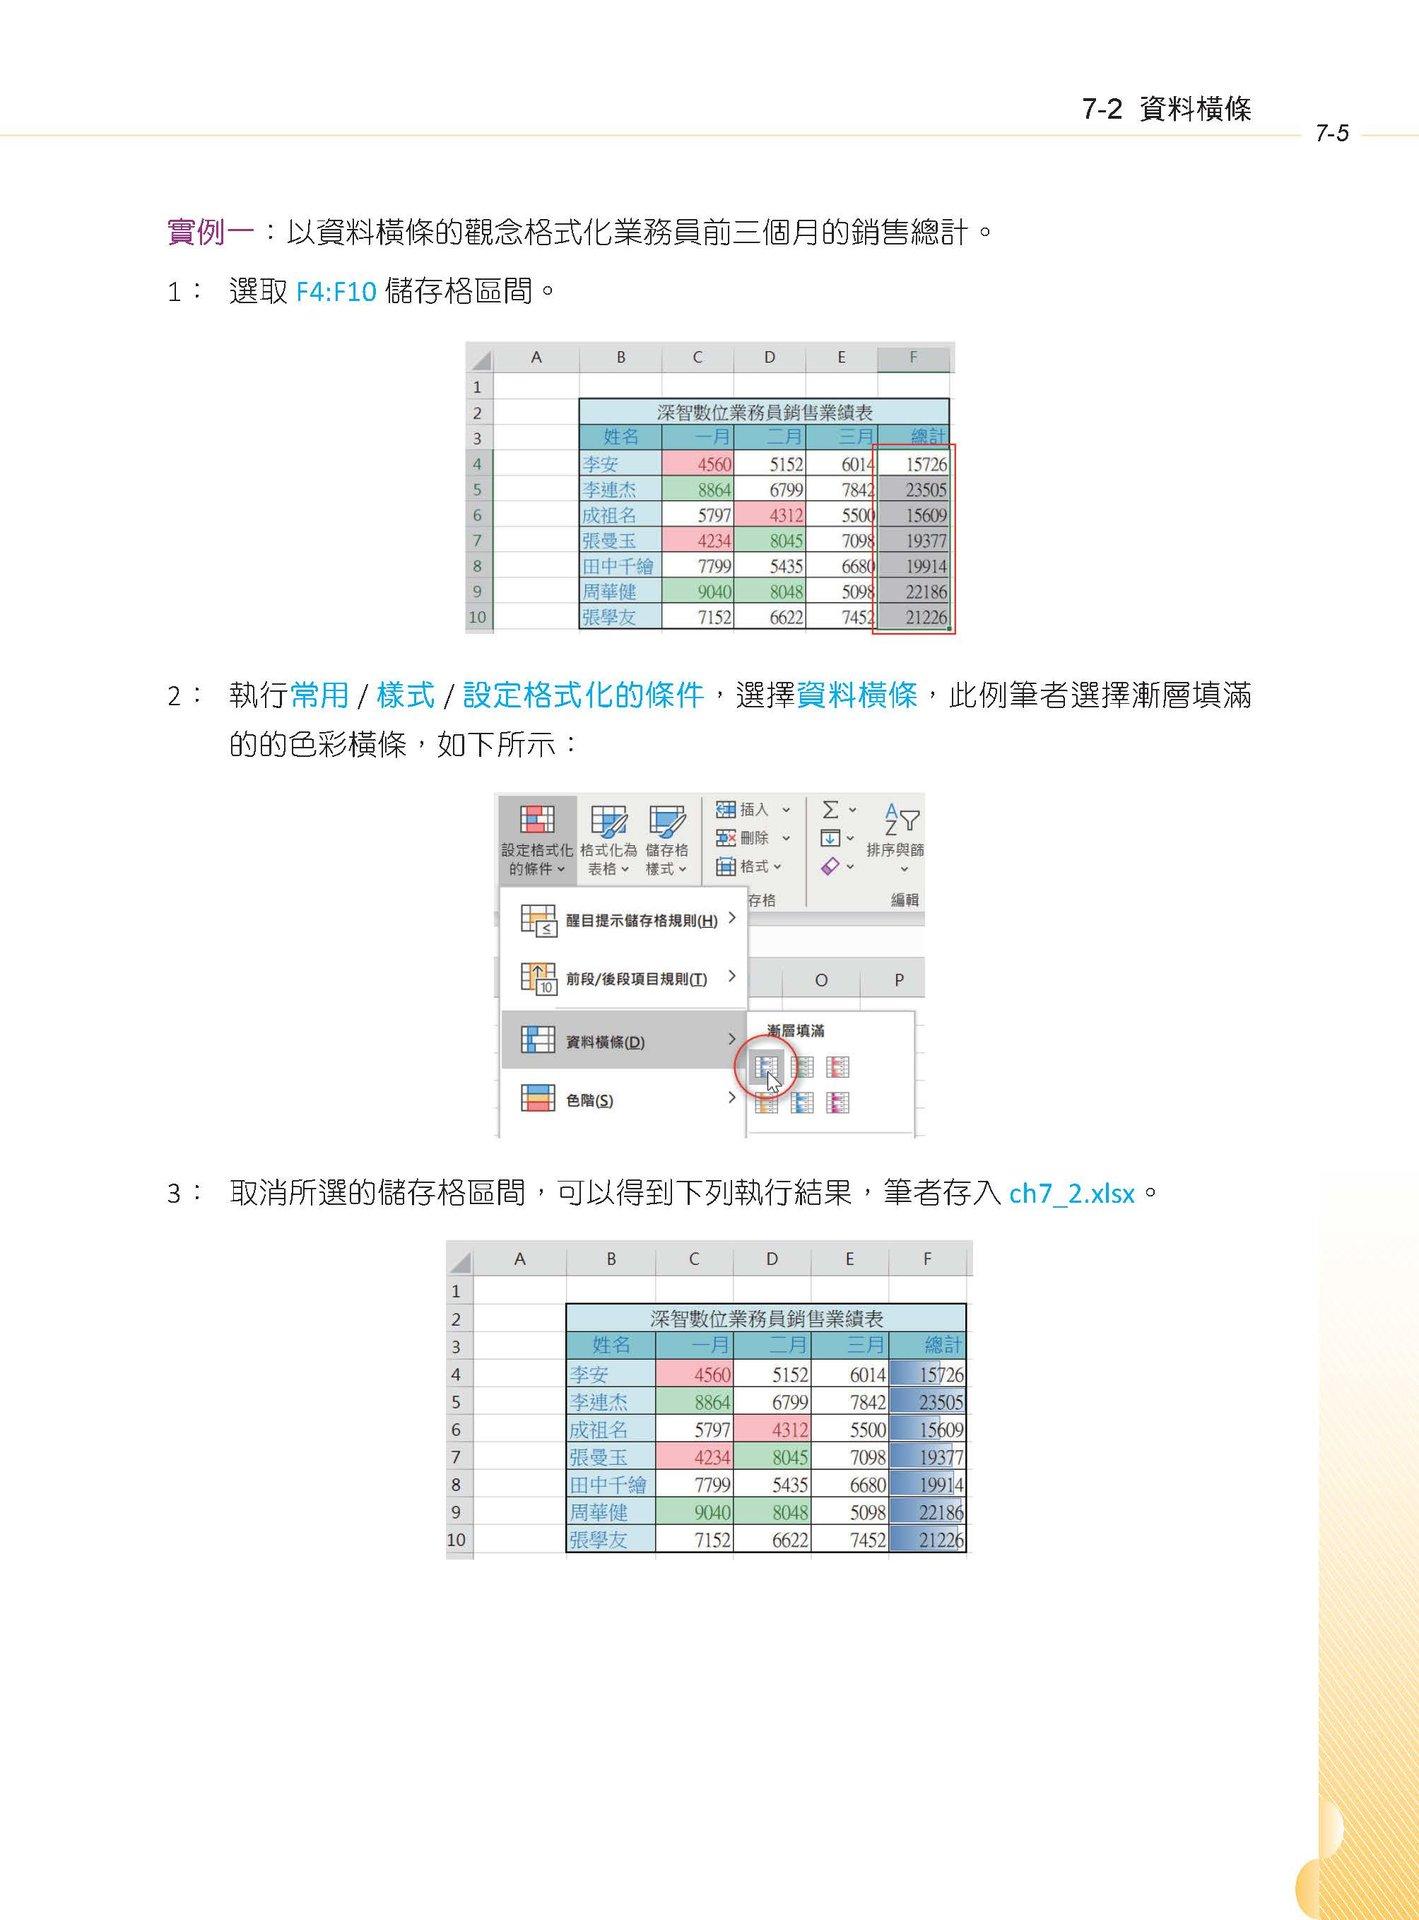 Excel 入門到完整學習 邁向最強職場應用—王者歸來 (全彩印刷)-preview-5